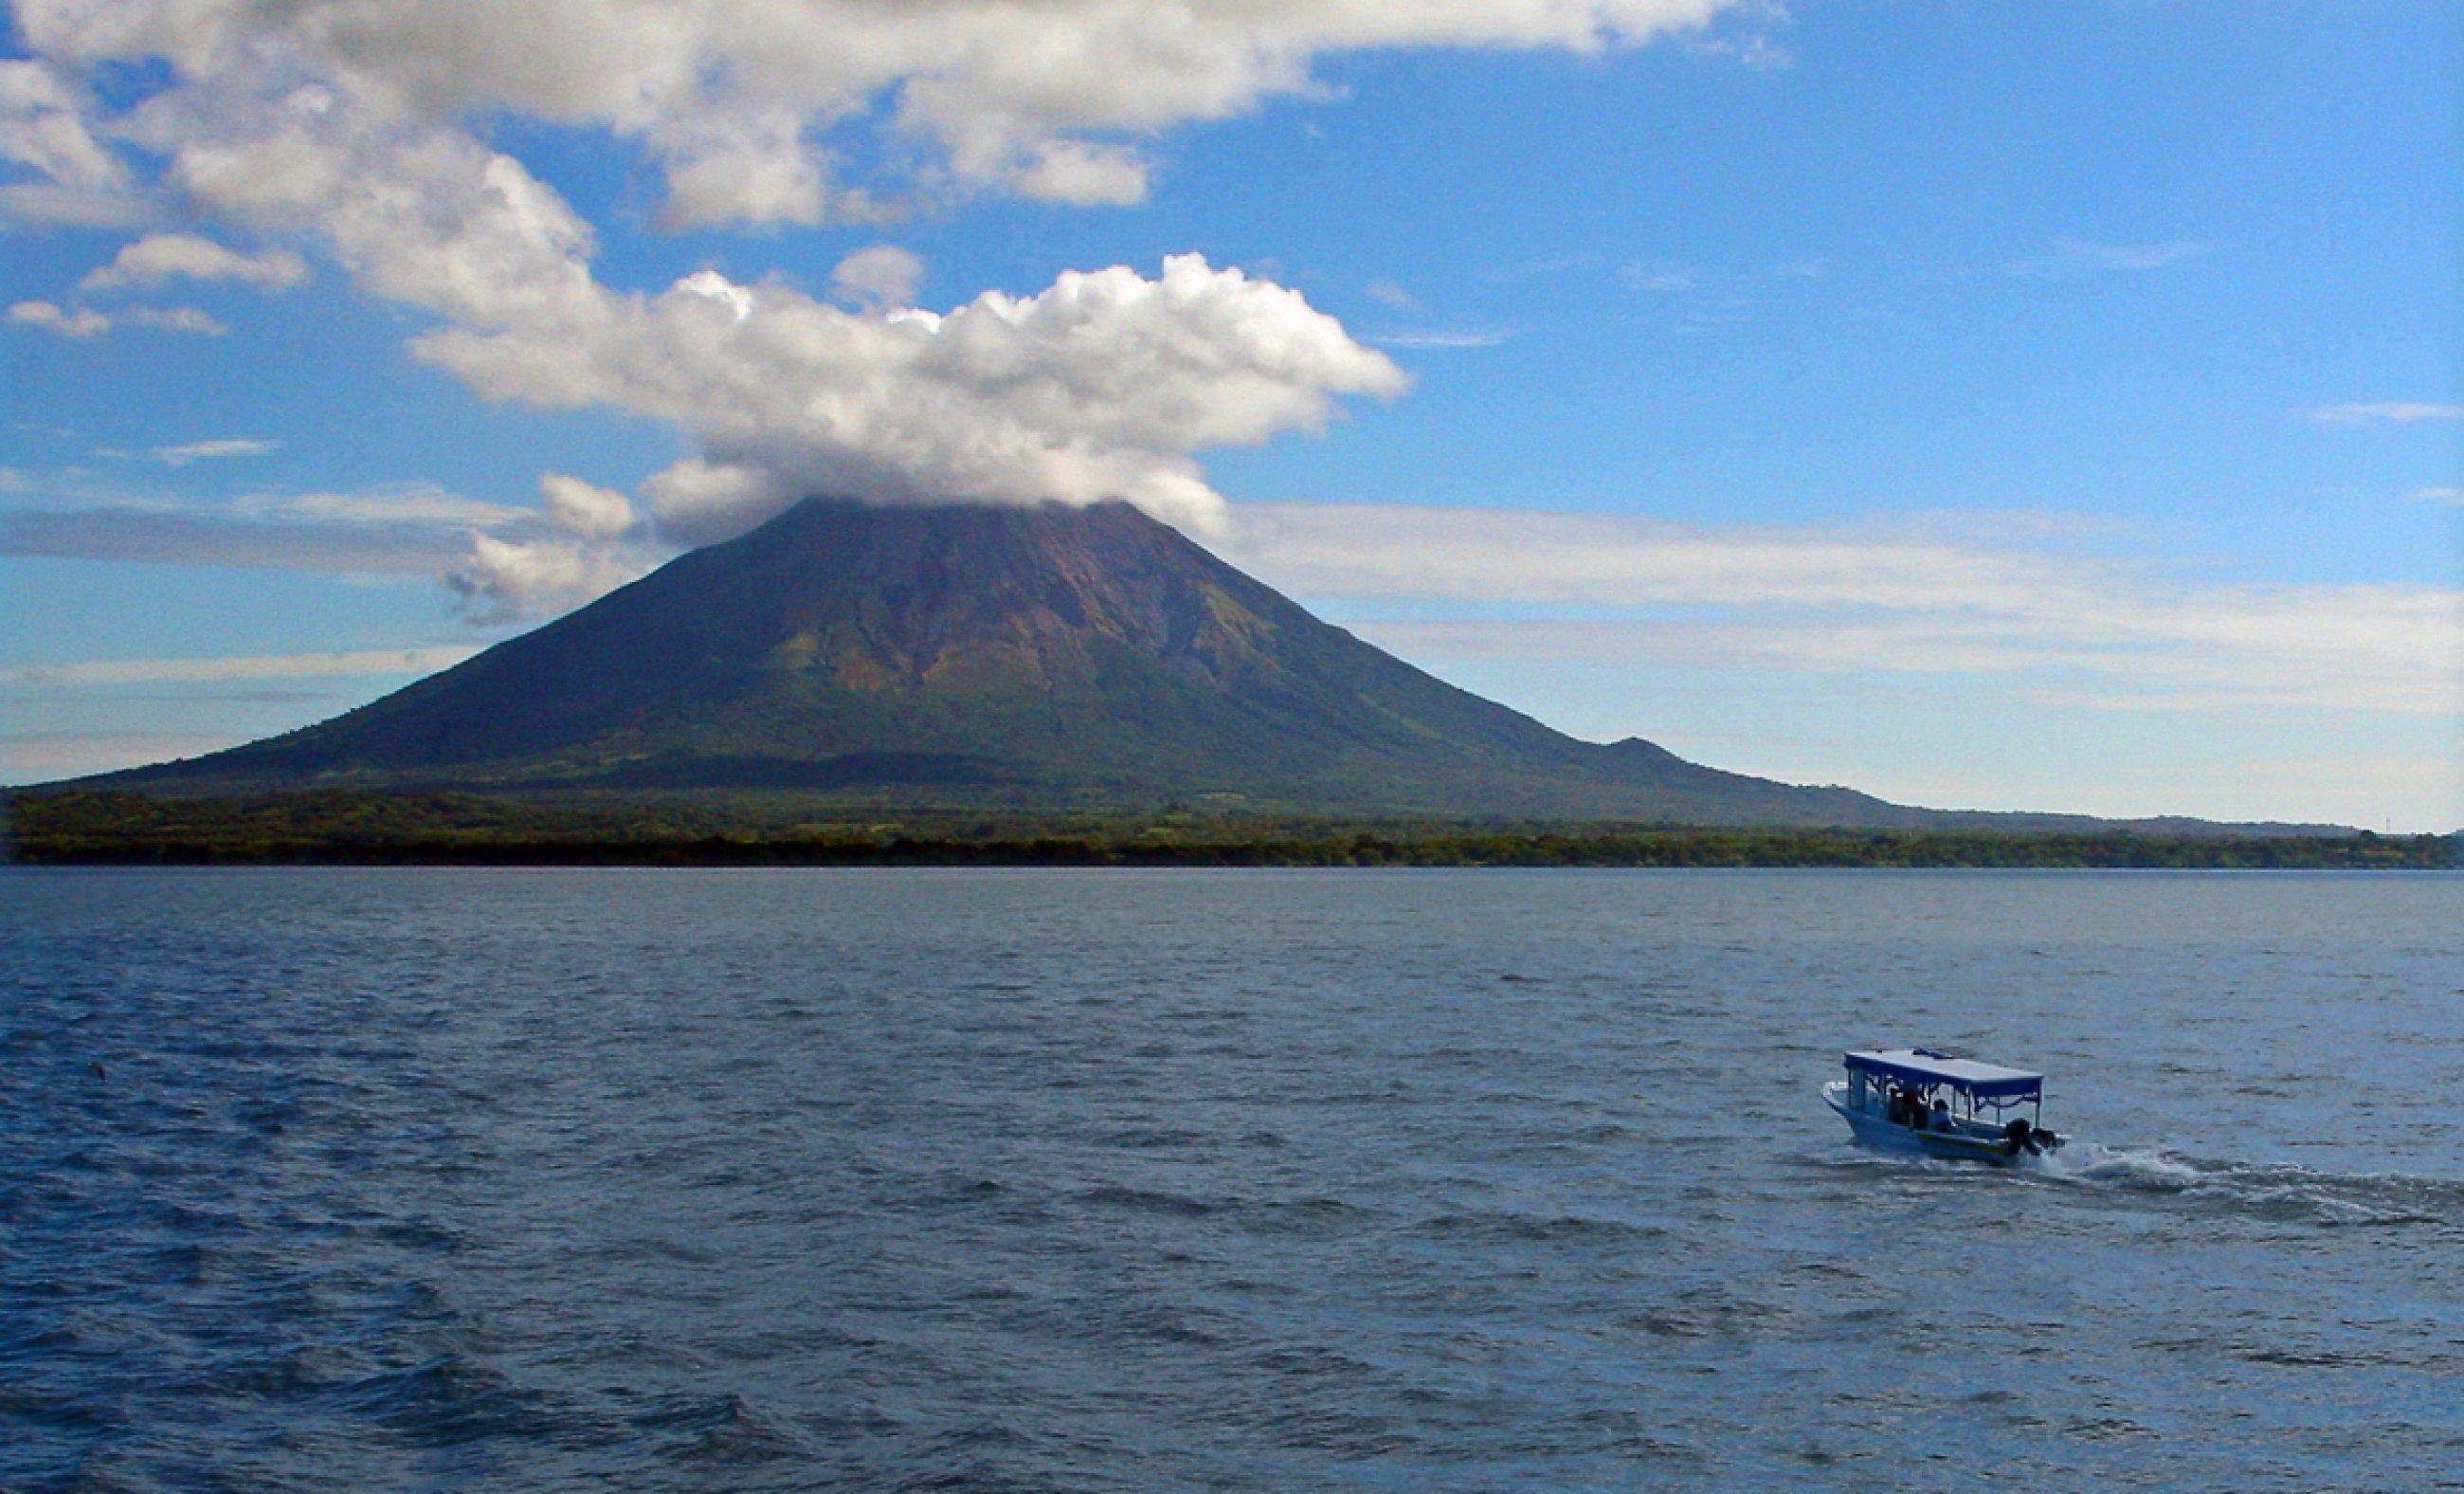 https://bubo.sk/uploads/galleries/7338/nikaragua-sopka-koncepcion-na-ostrove-ometepe.jpg